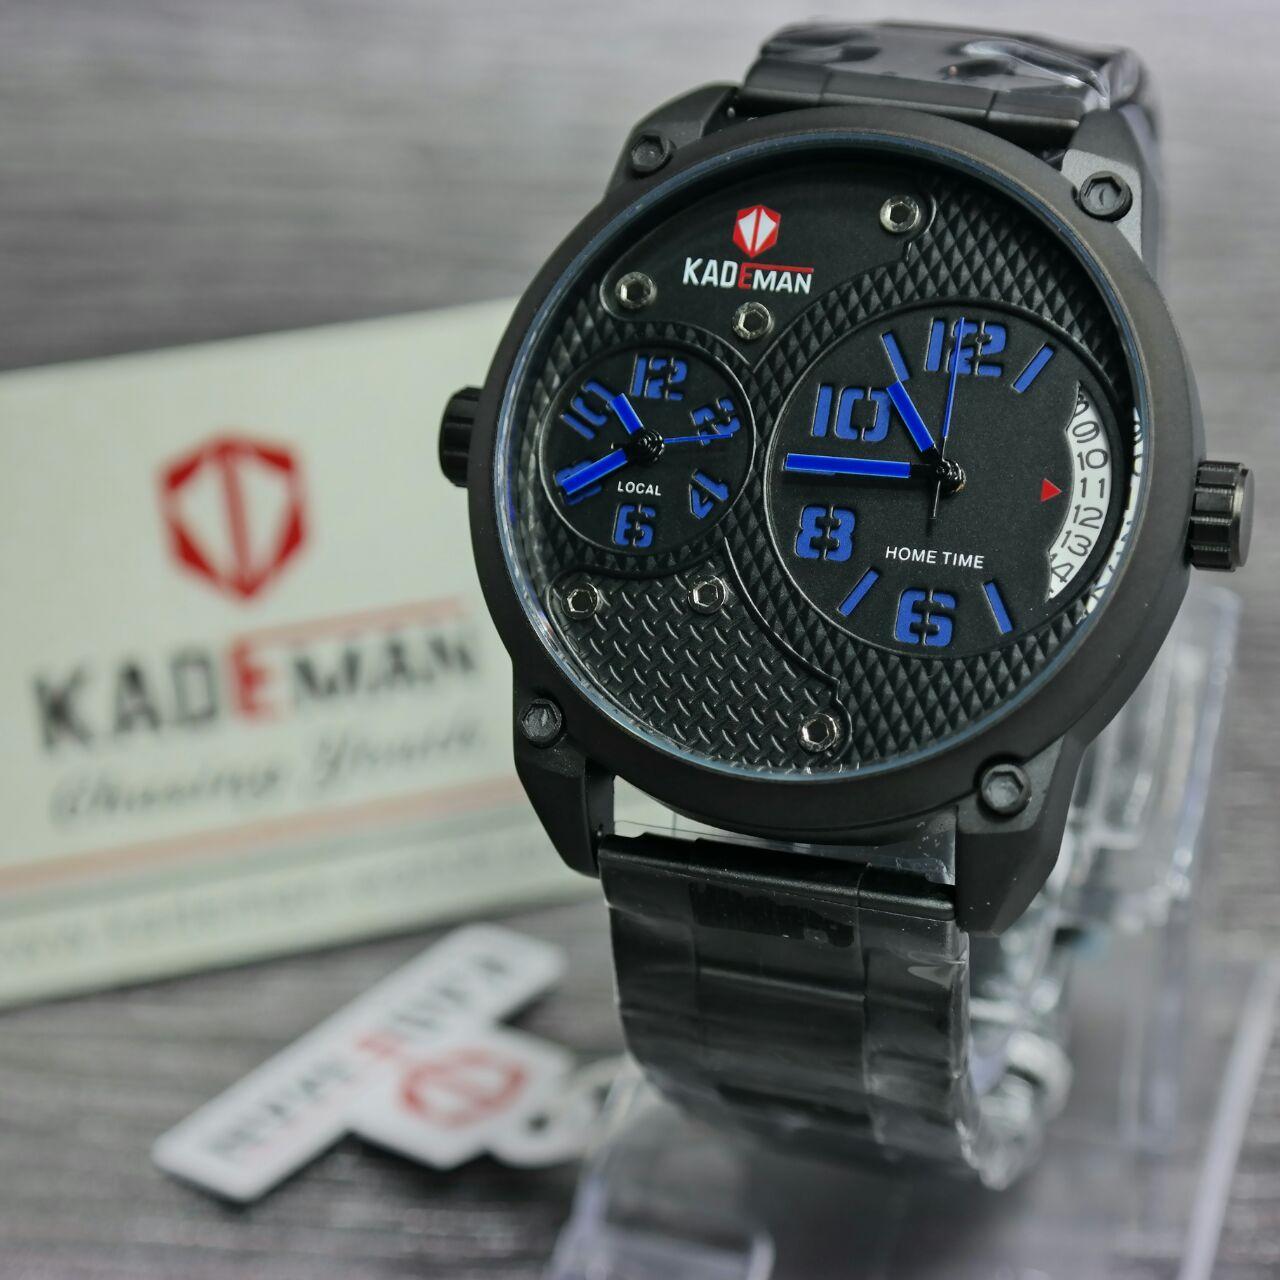 Kademan - Jam tangan Pria - Dual time Analog - Design Casual - Leather strap